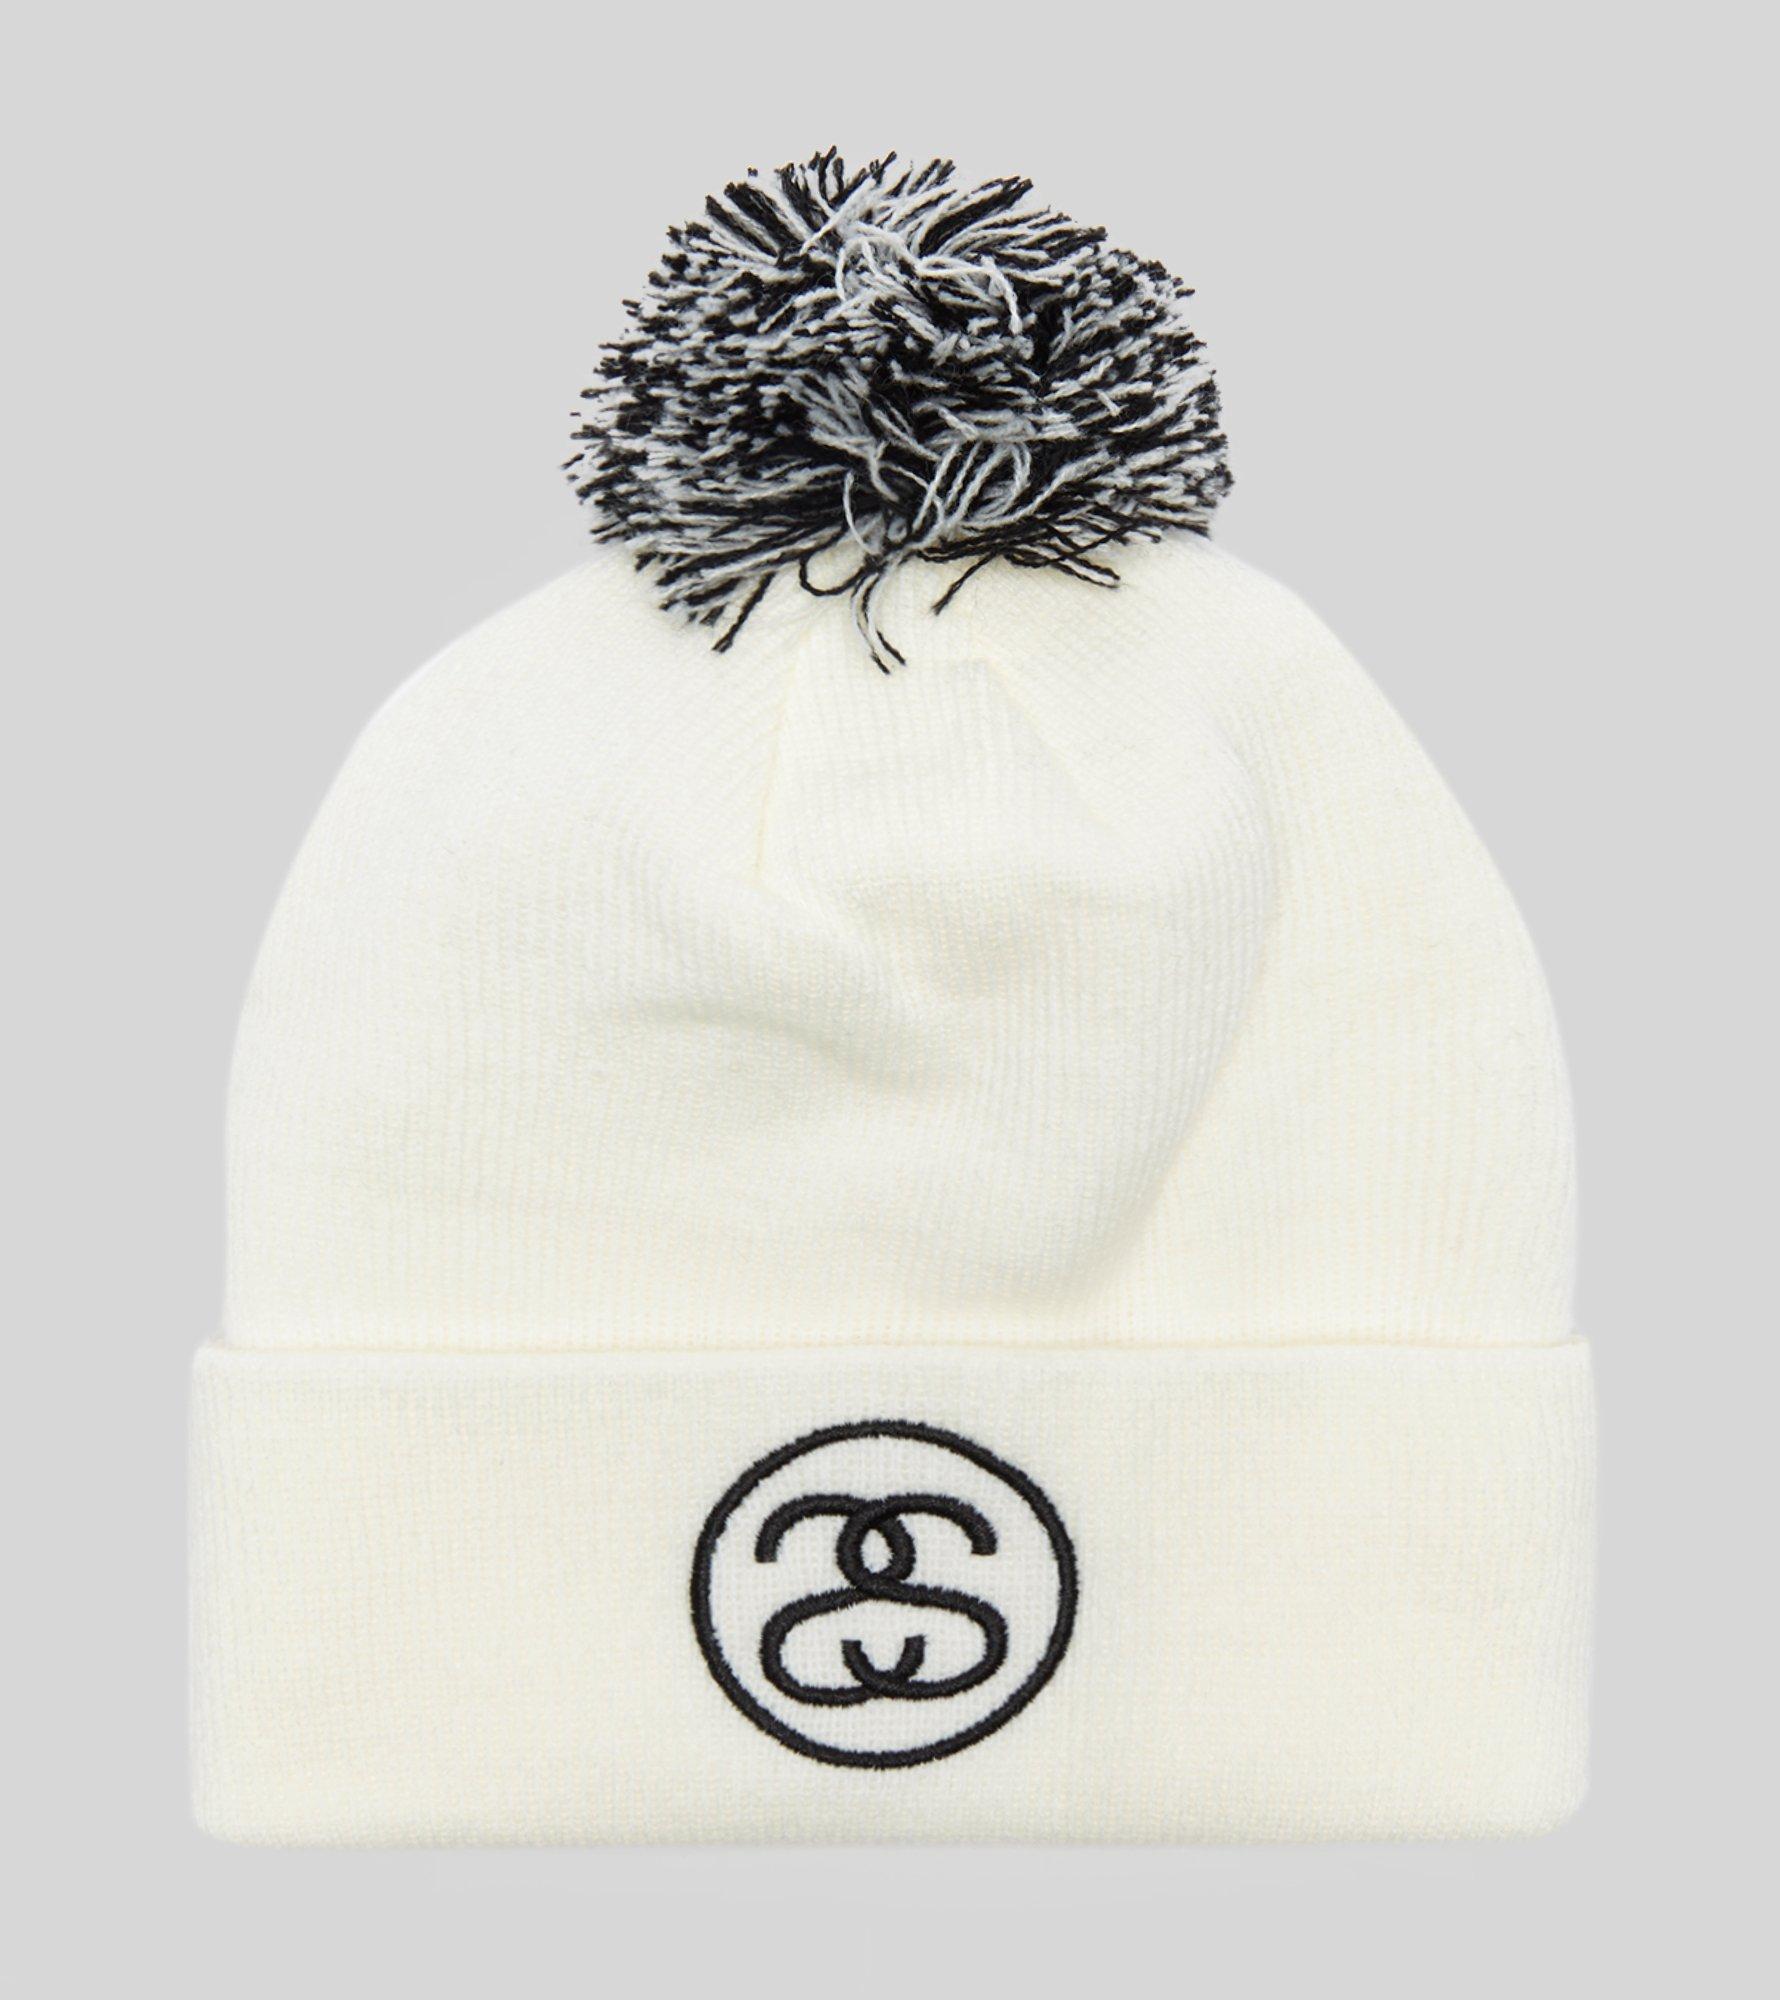 5d8e17414b2 Lyst - Stussy Ss Link Pom Beanie Hat in White